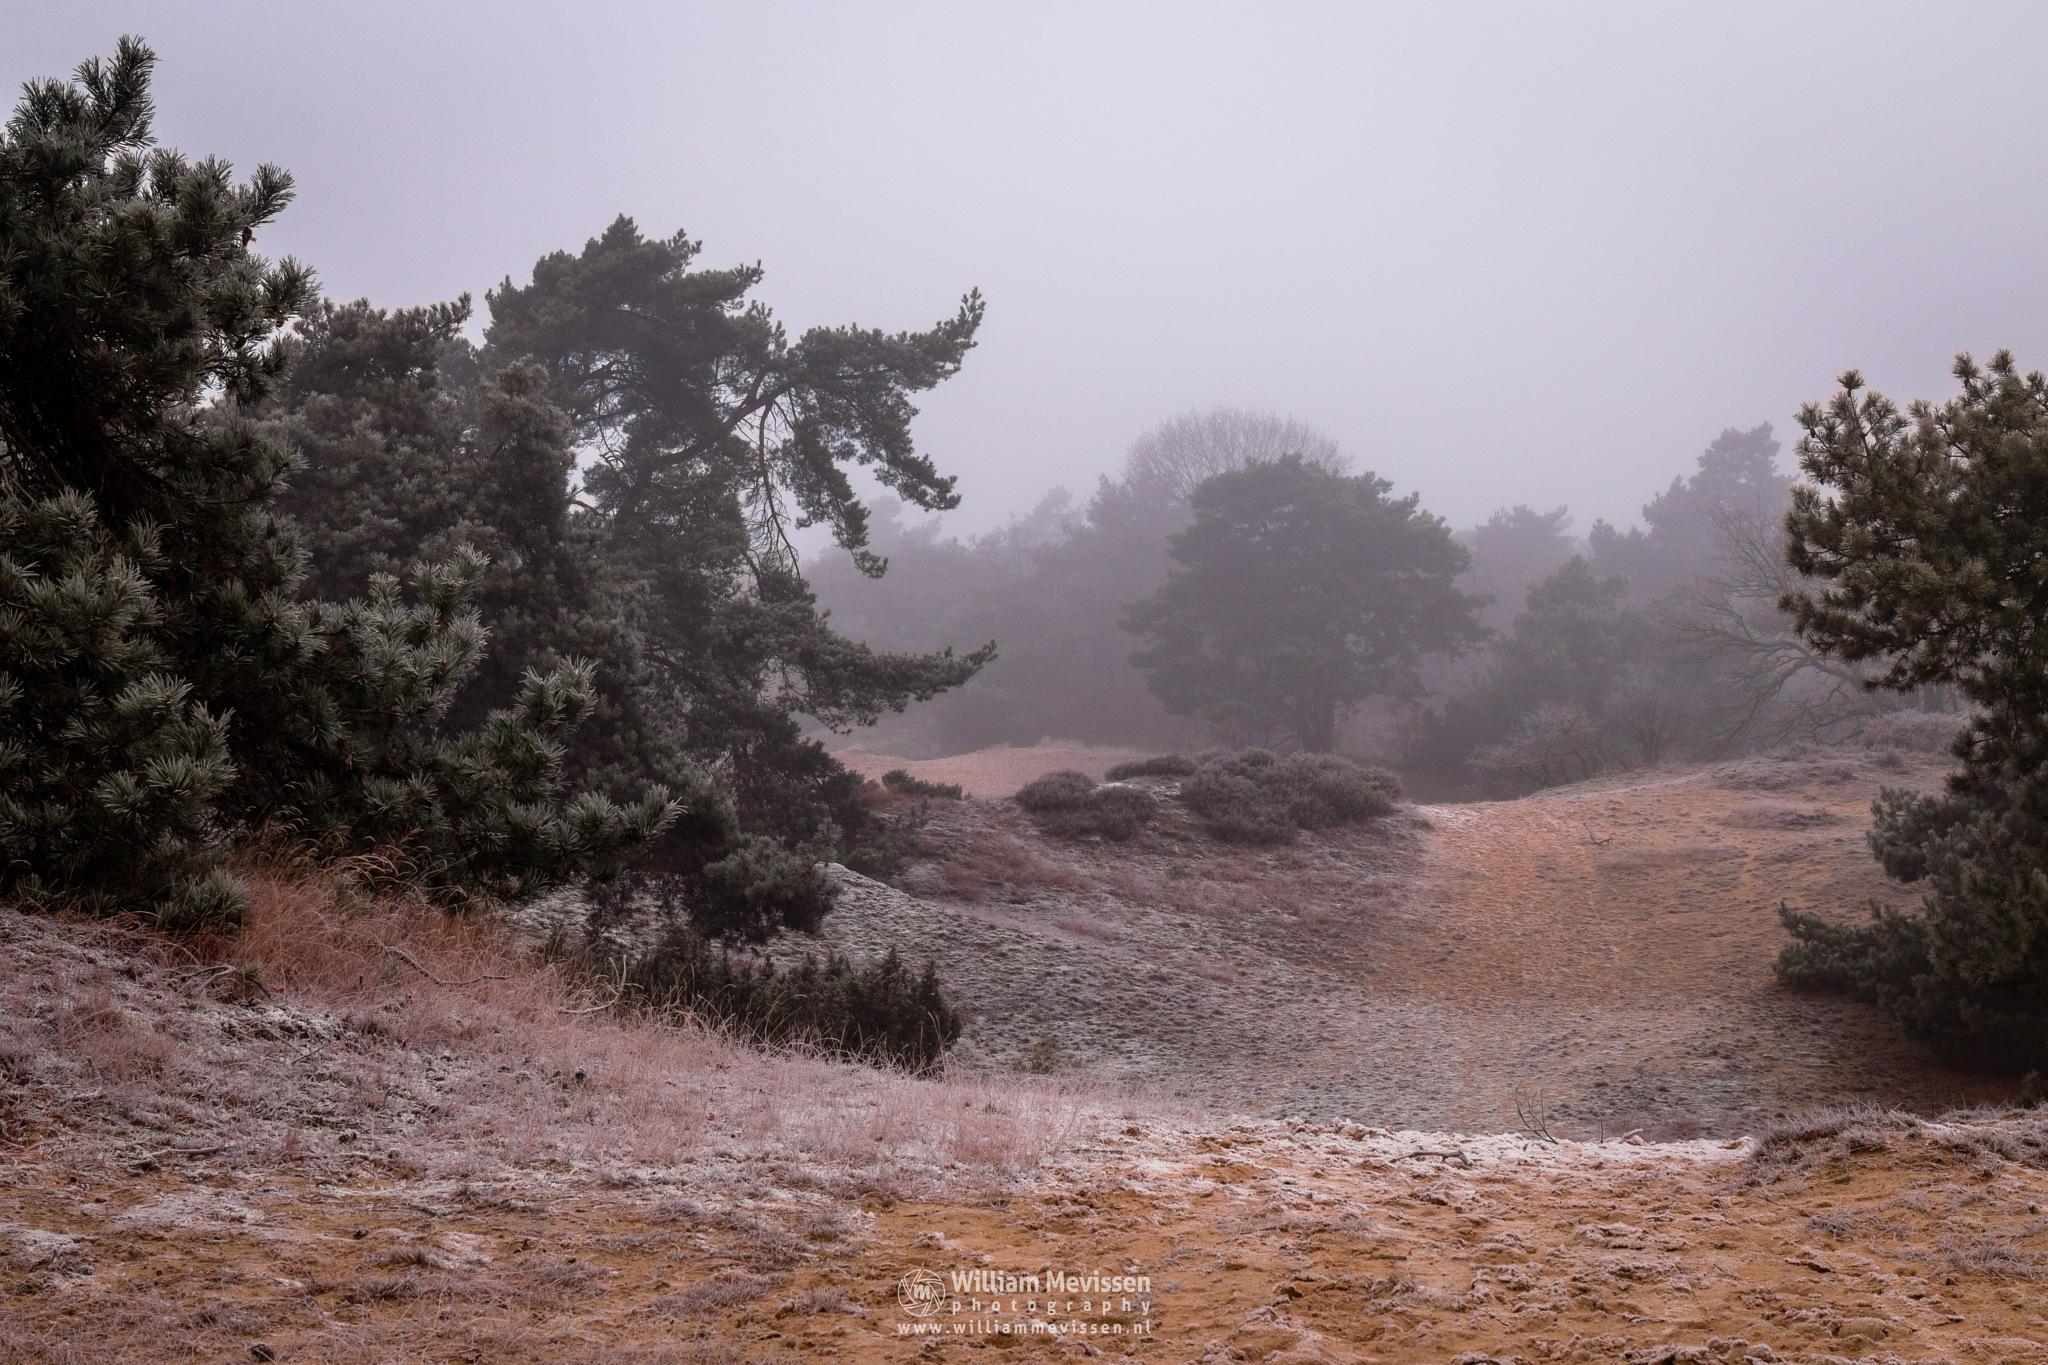 Misty Dunes by William Mevissen